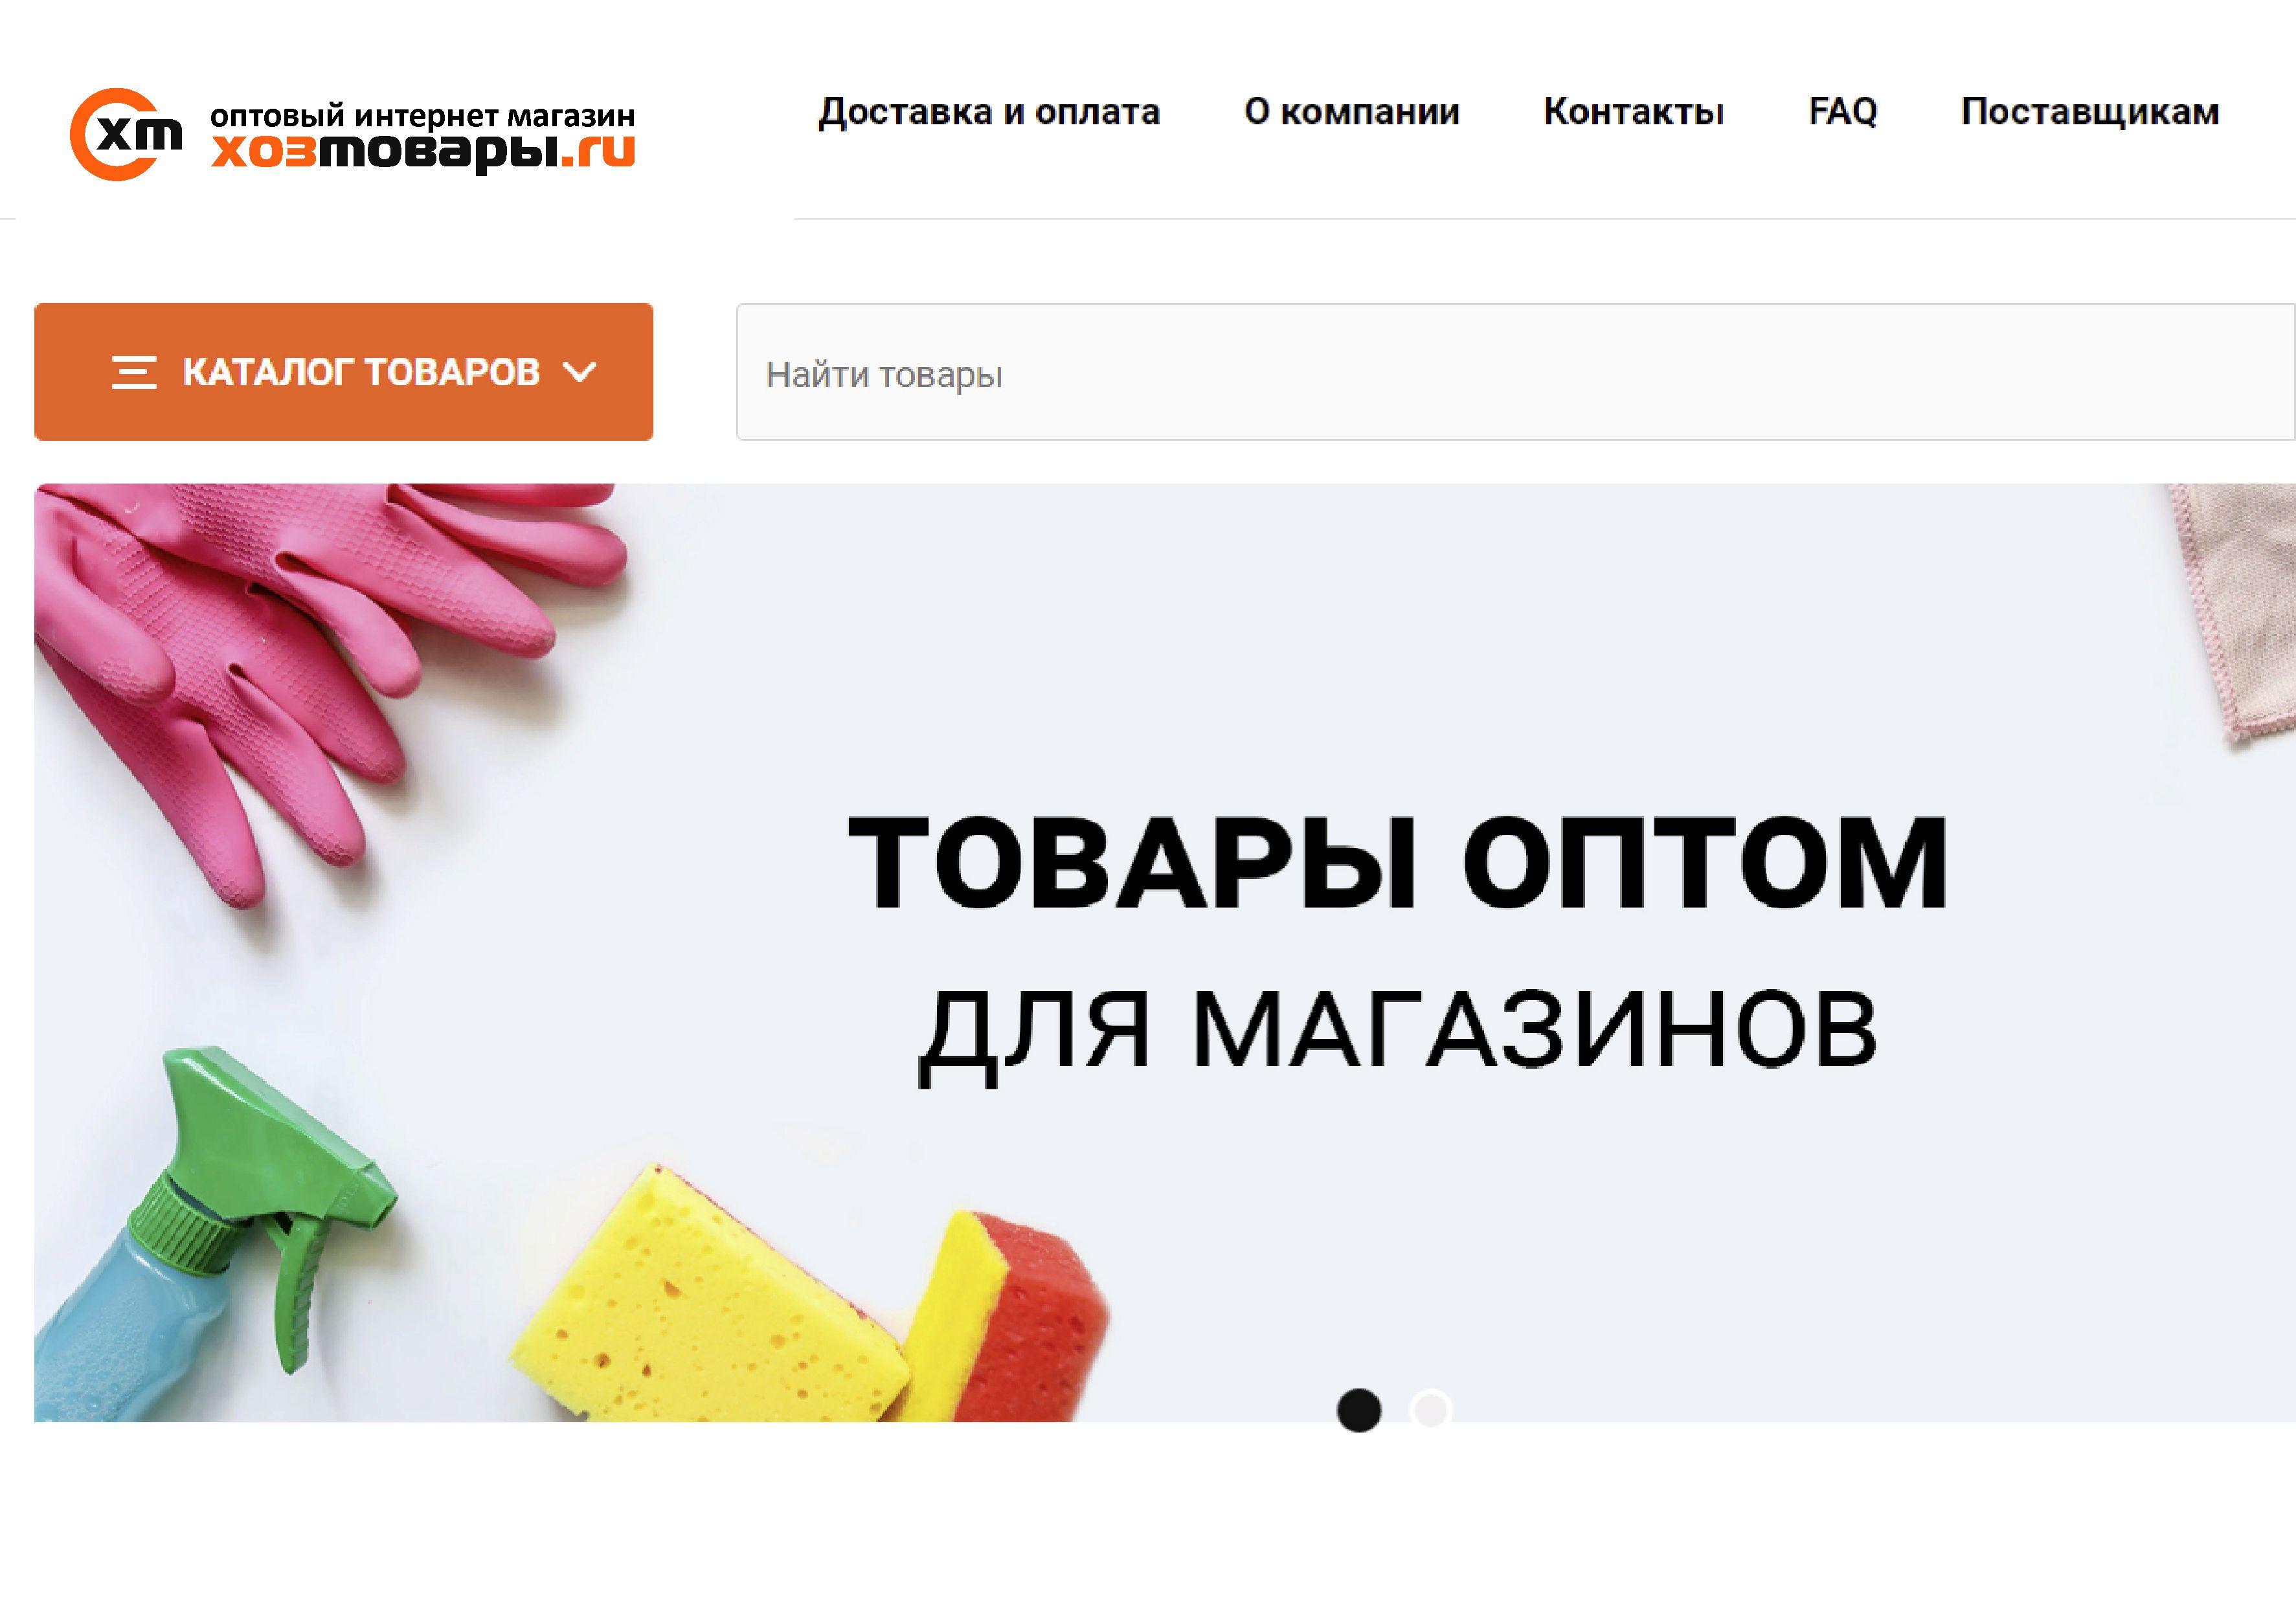 Разработка логотипа для оптового интернет-магазина «Хозтовары.ру» фото f_1446070d3d35aaab.jpg